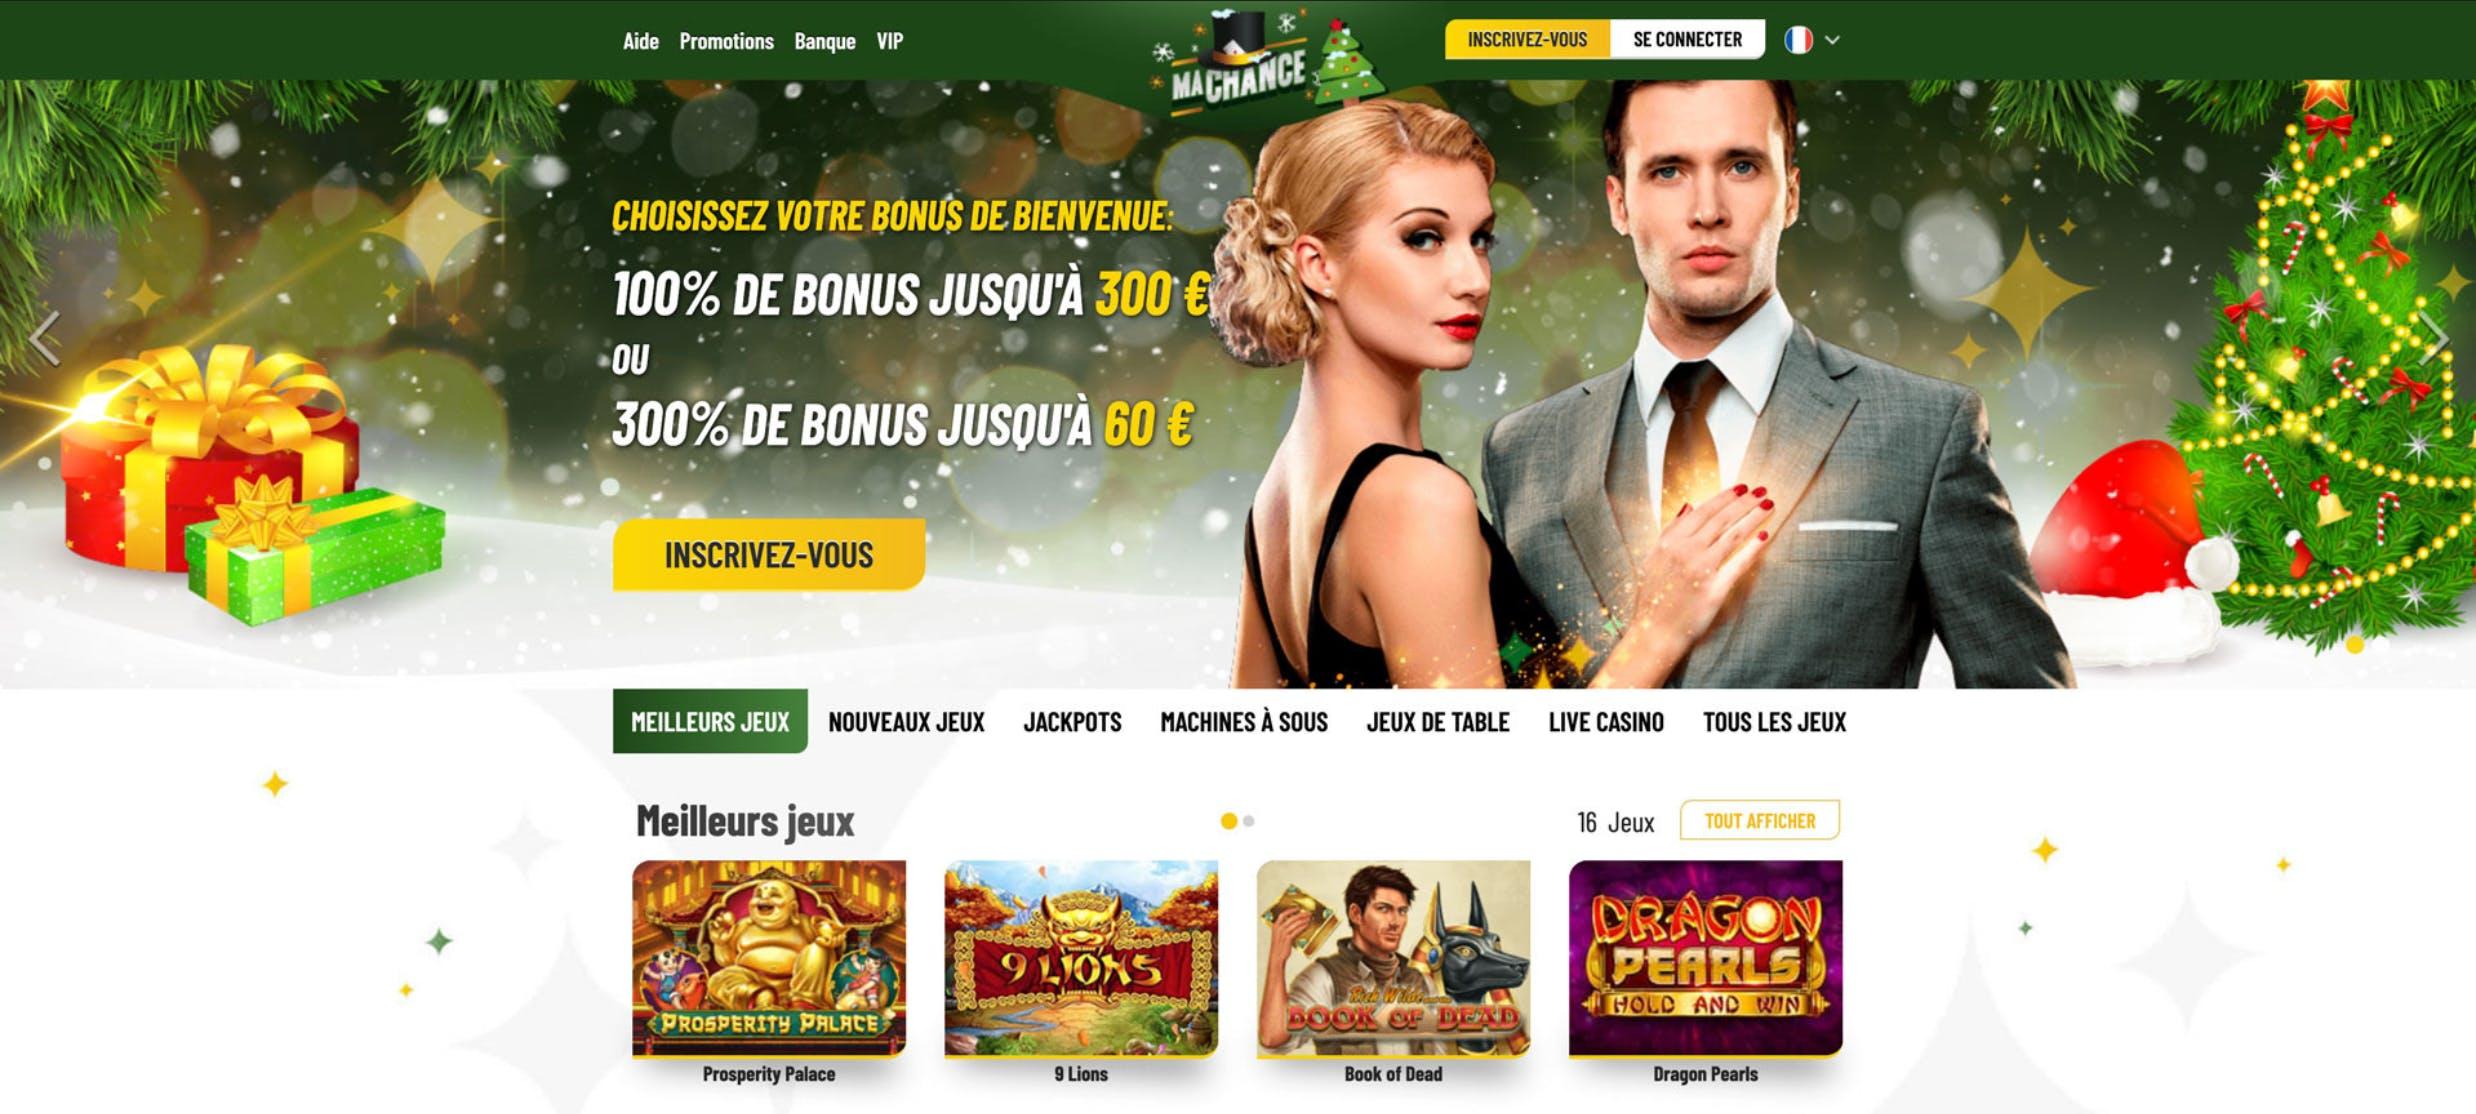 landing page of mychance casino online HD